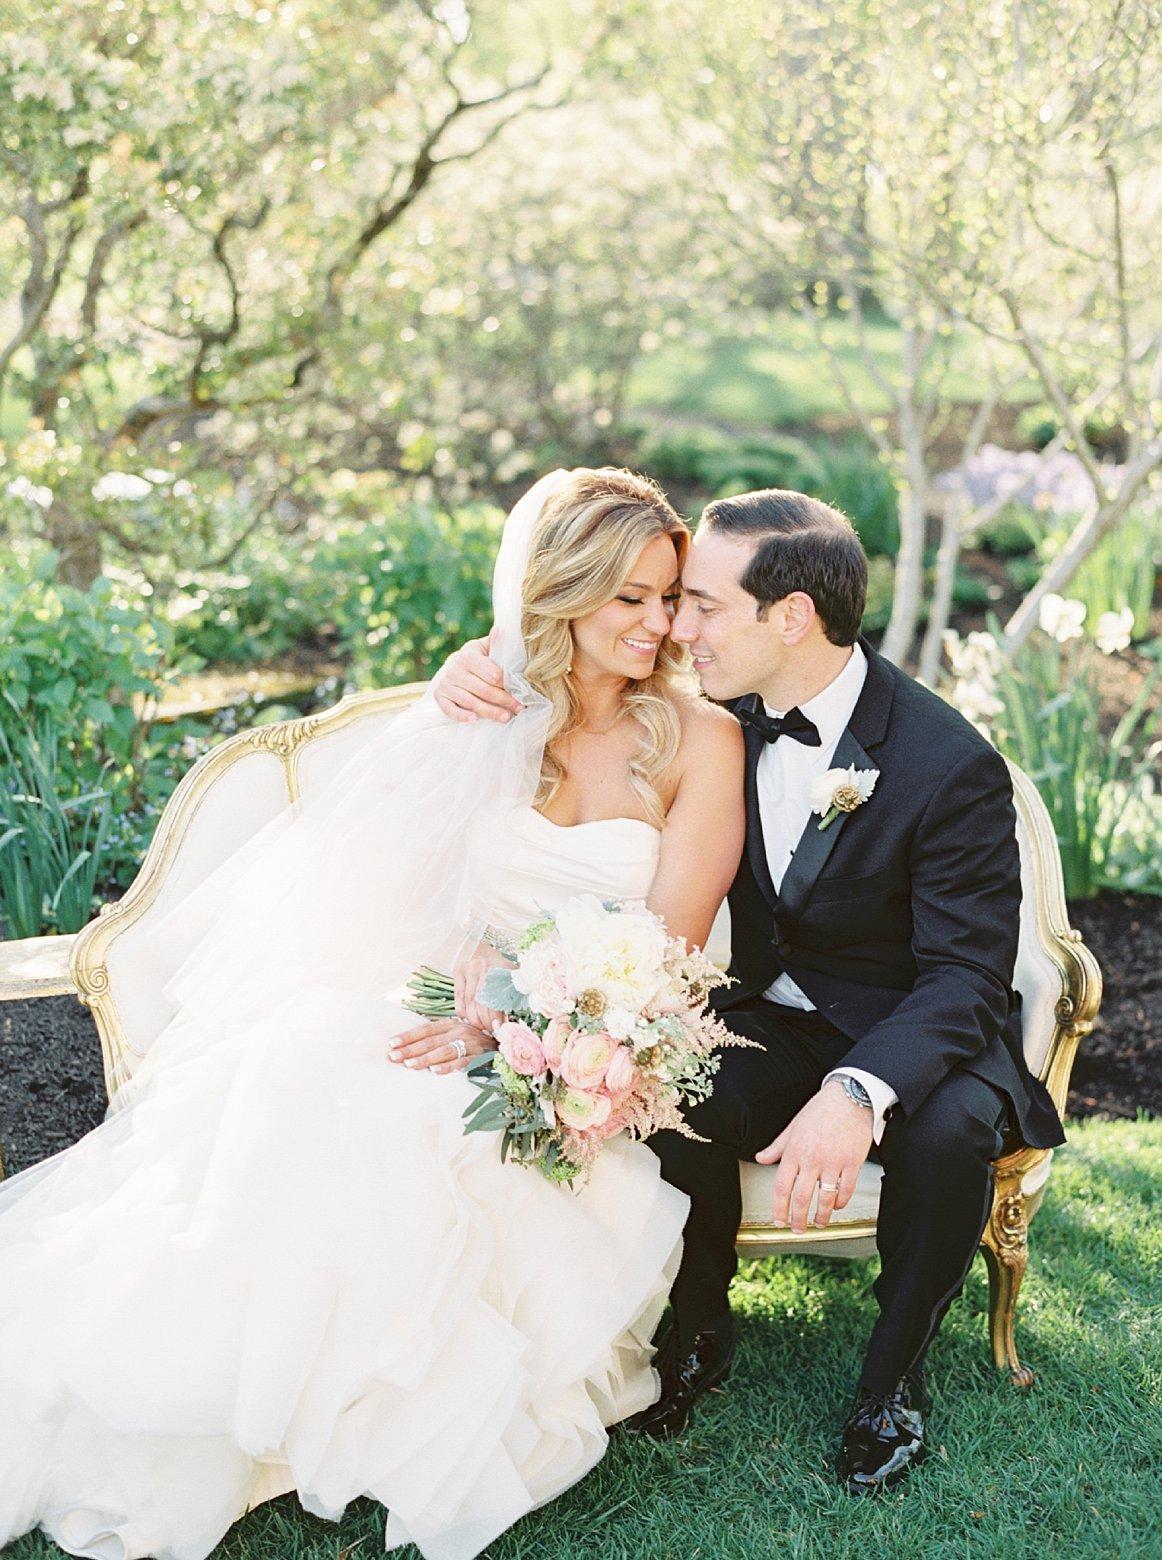 lauren_fair_photography_april_lynn_designs_stasia_matt_spring_cairnwood_estate_wedding_northeast_philadelphia_blush_pink_gold_wedding_invitation_stationery_0093